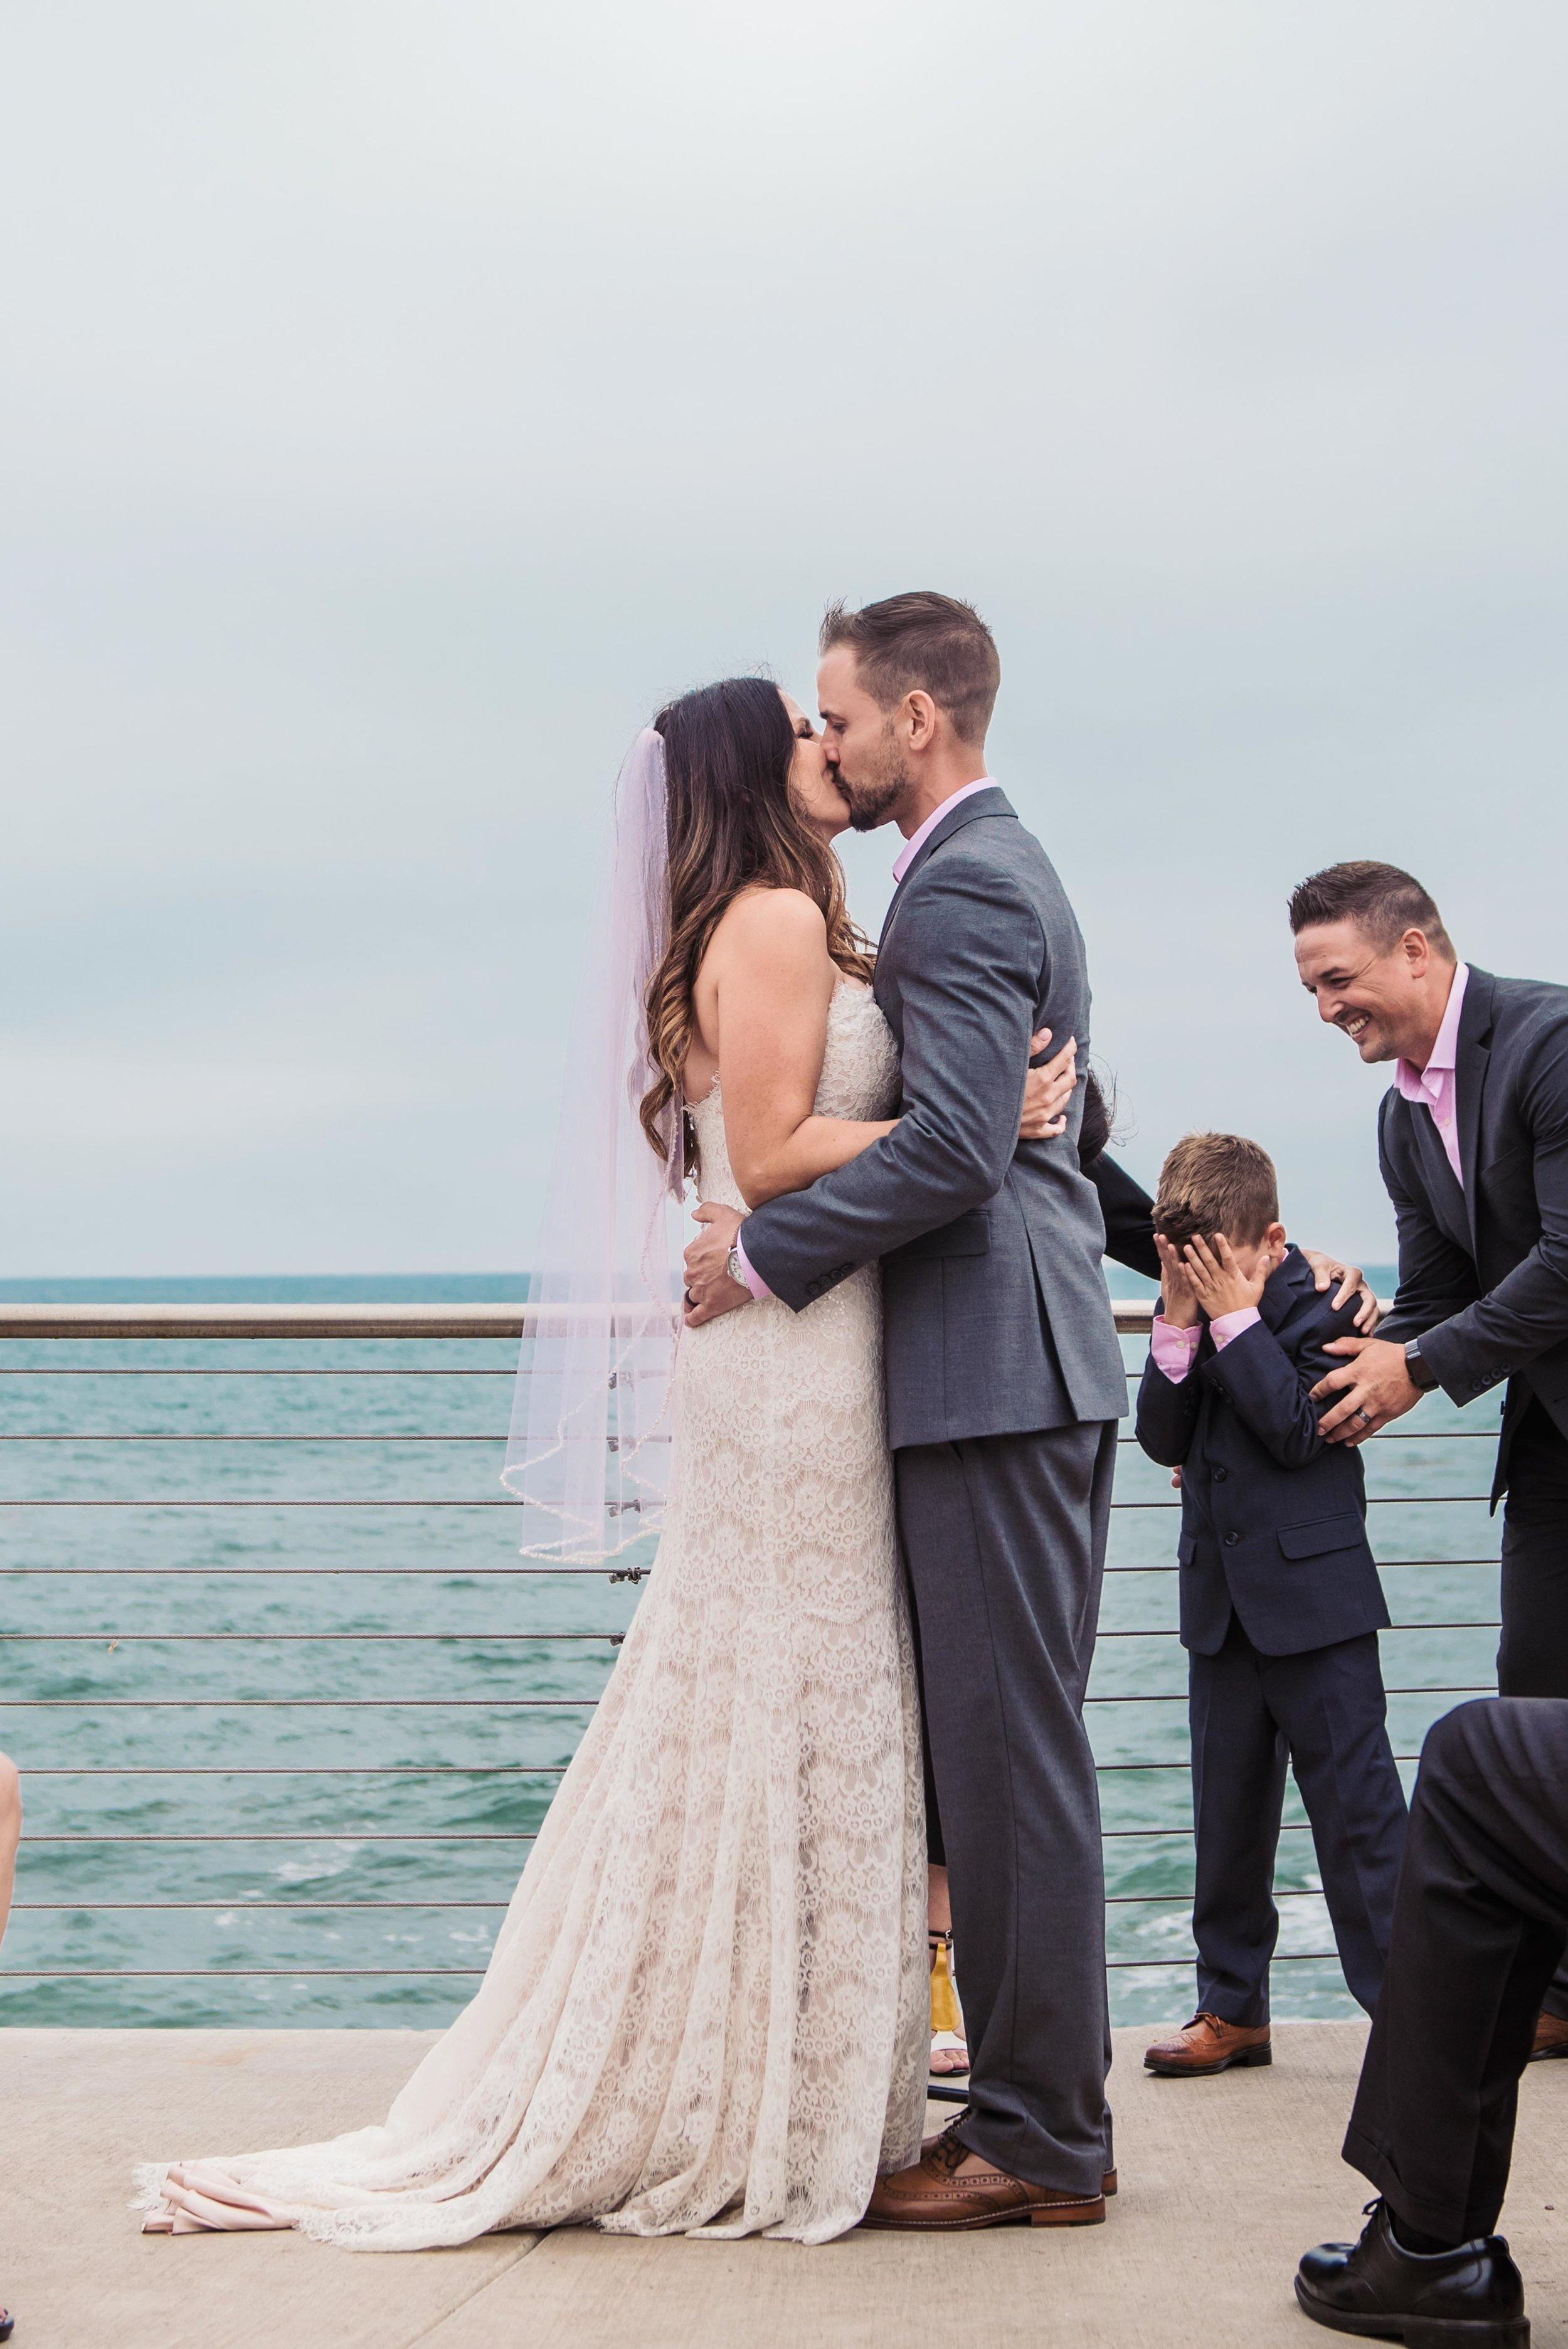 weddingwebsitesmallerpics-316.jpg